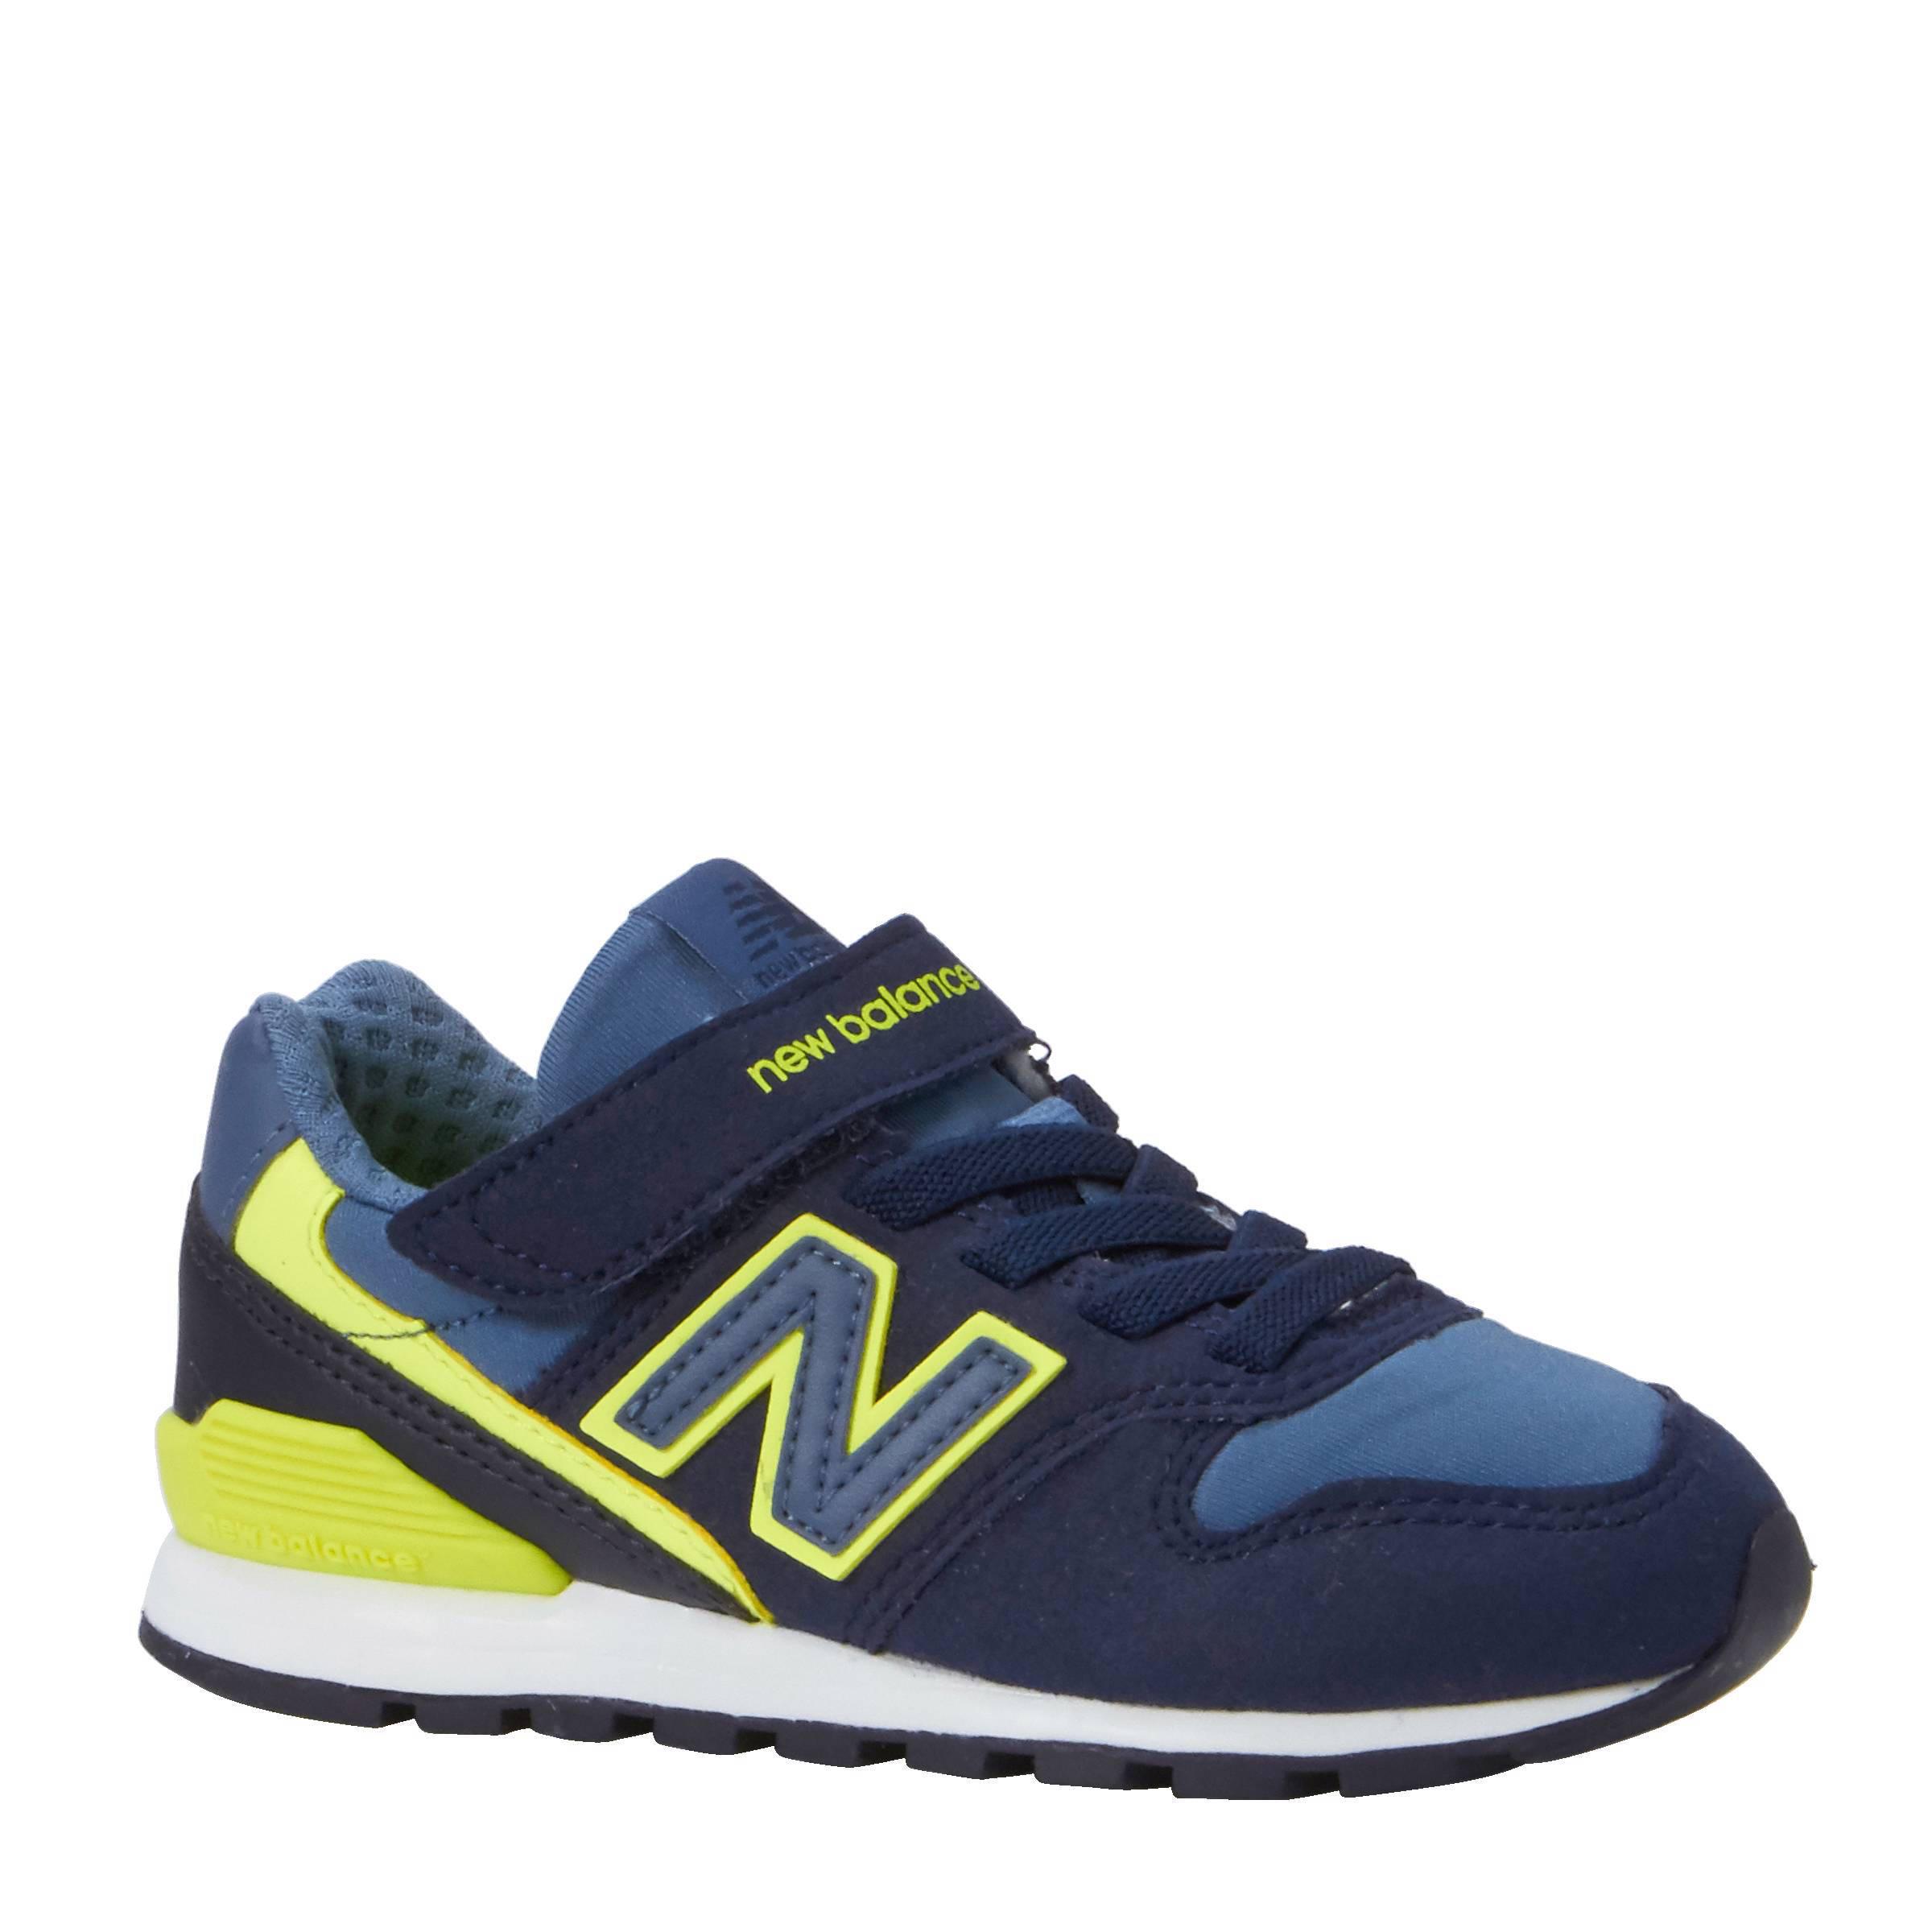 new balance blauw geel